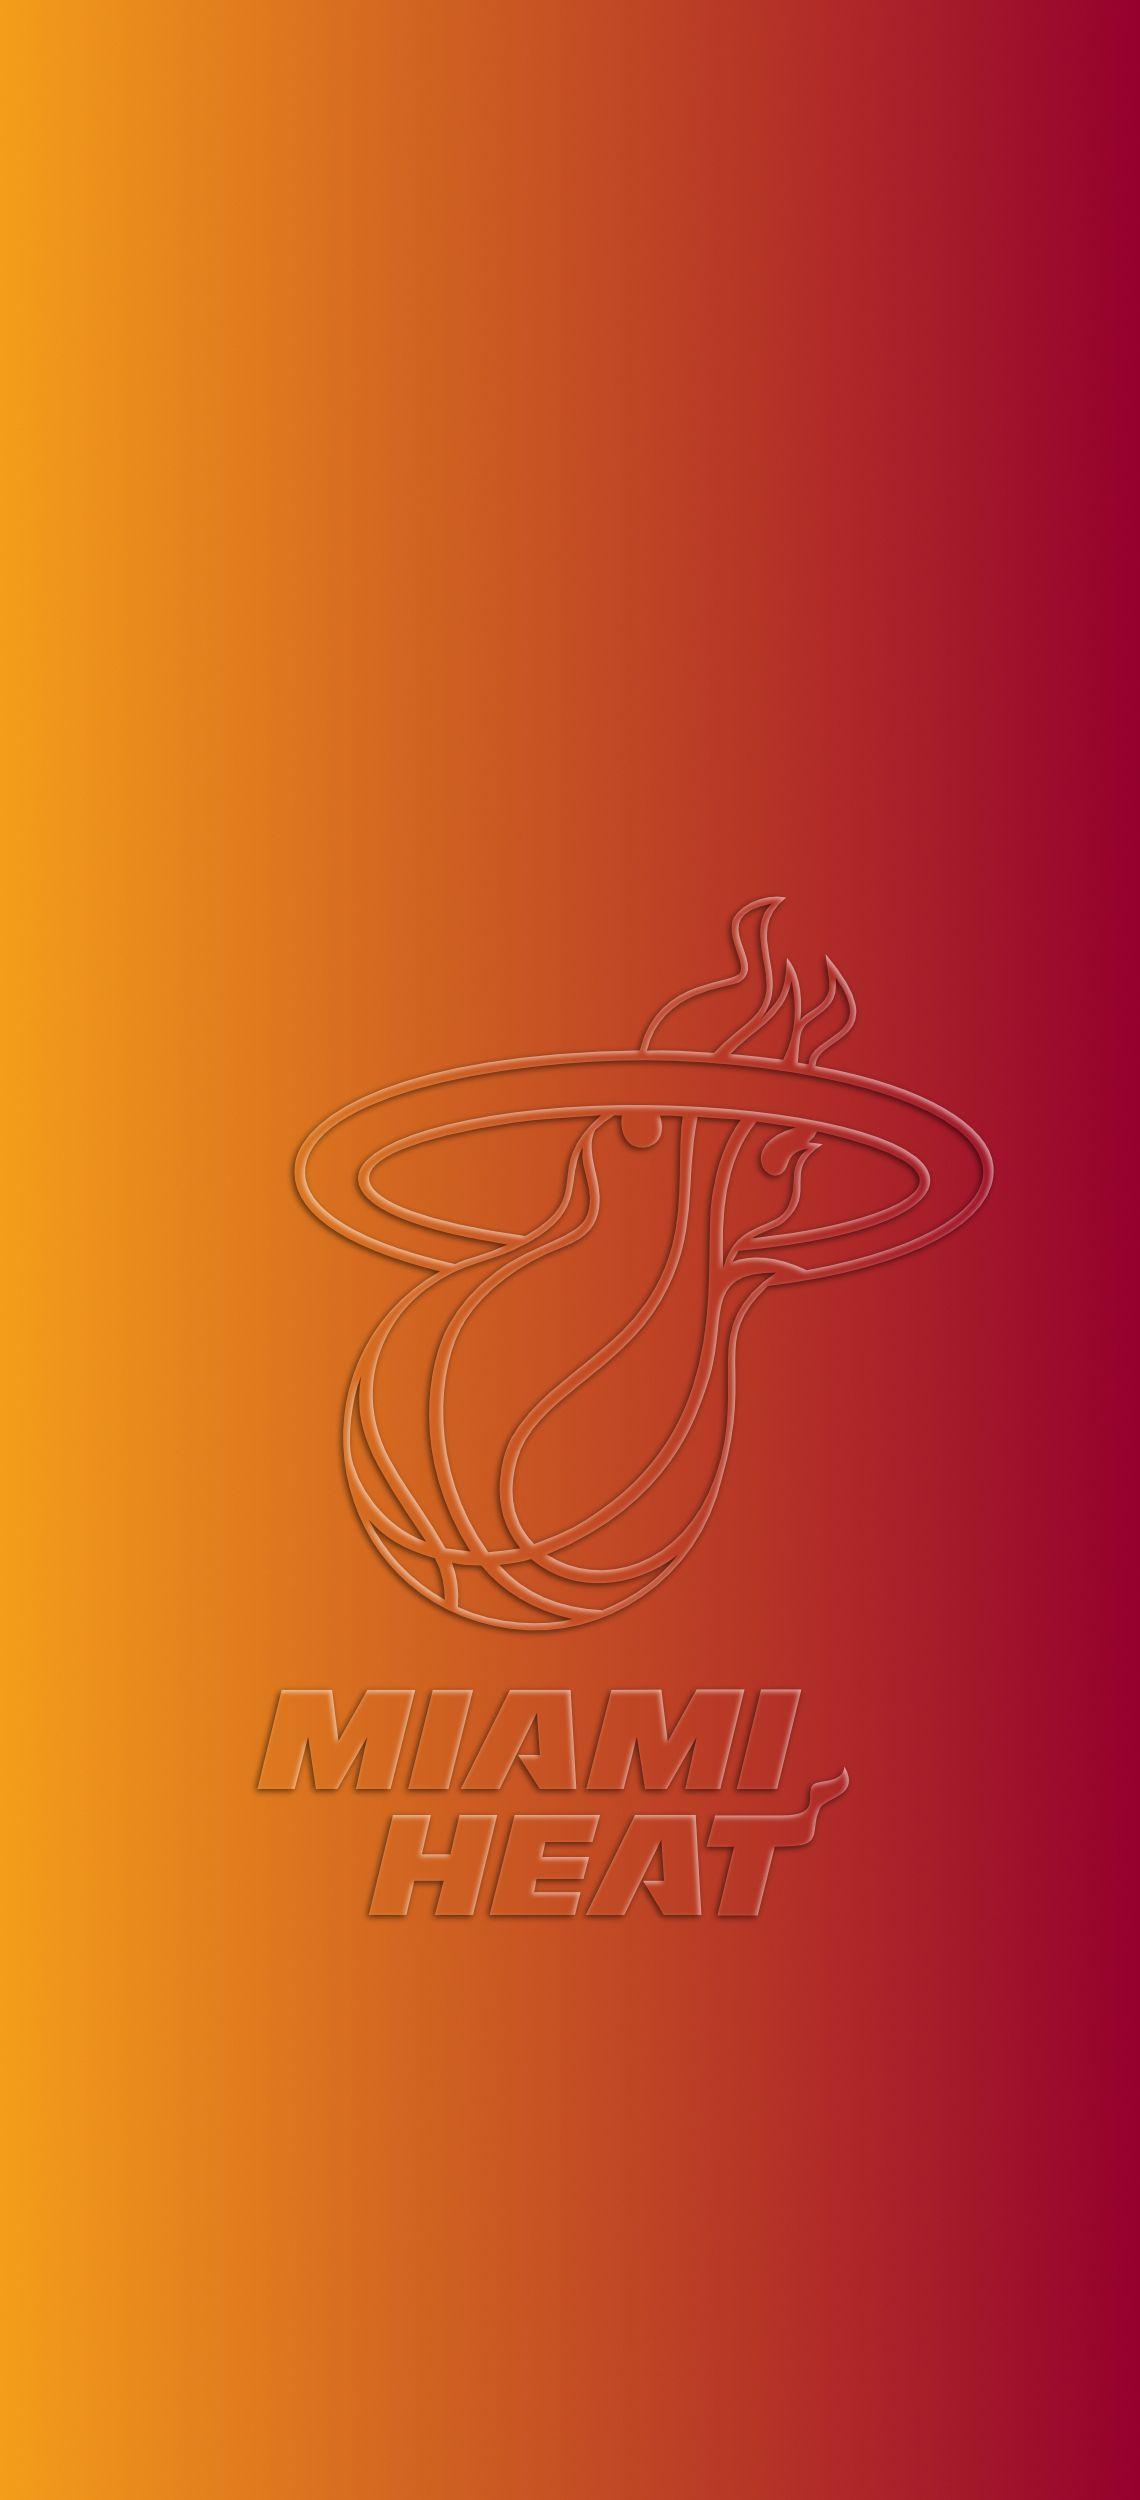 Sportsign Shop Redbubble Miami Heat Miami Heat Basketball Nba Basketball Teams